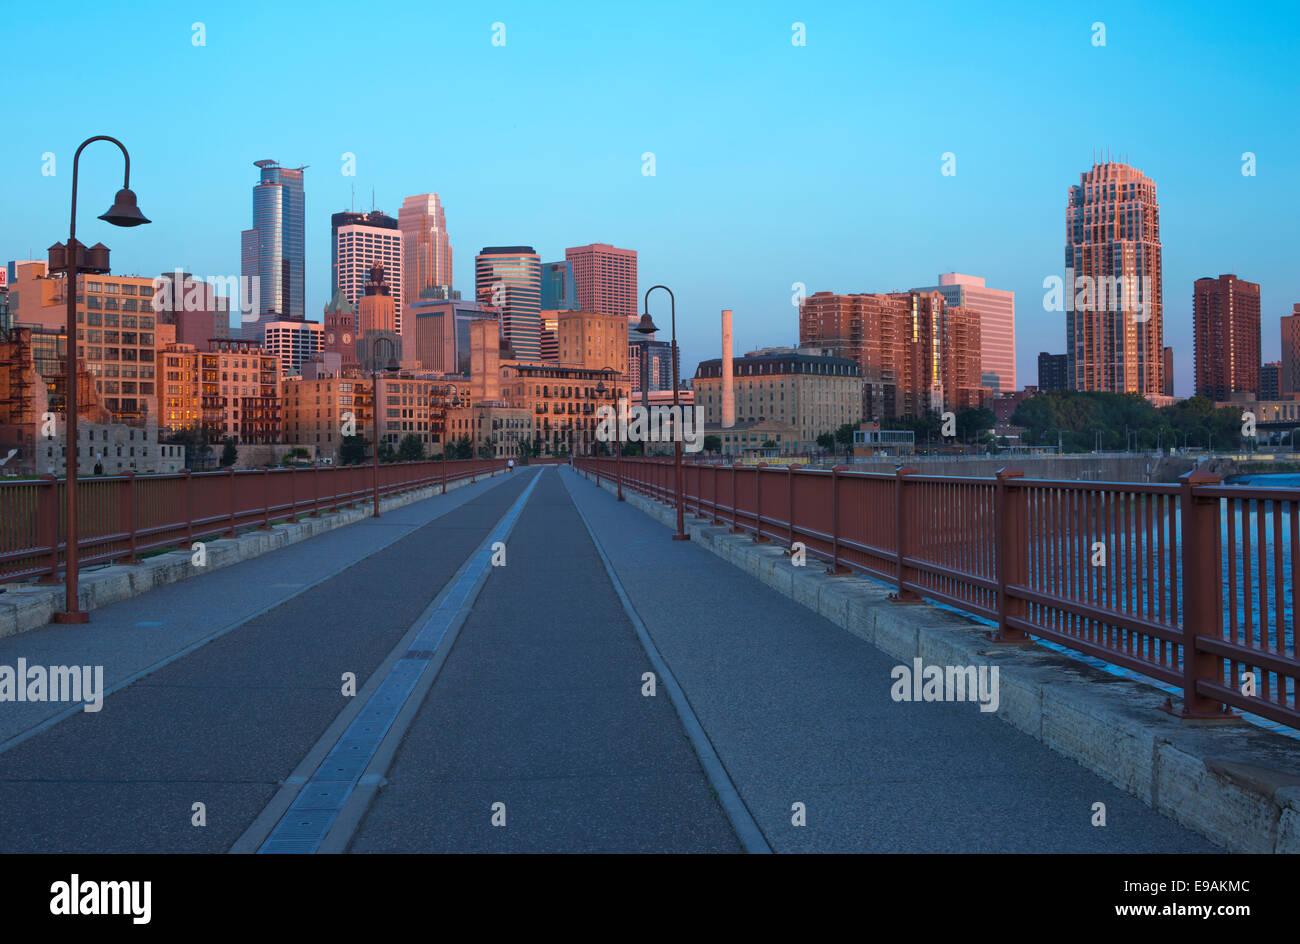 STONE ARCH BRIDGE MISSISSIPPI RIVER MINNEAPOLIS MINNESOTA USA - Stock Image